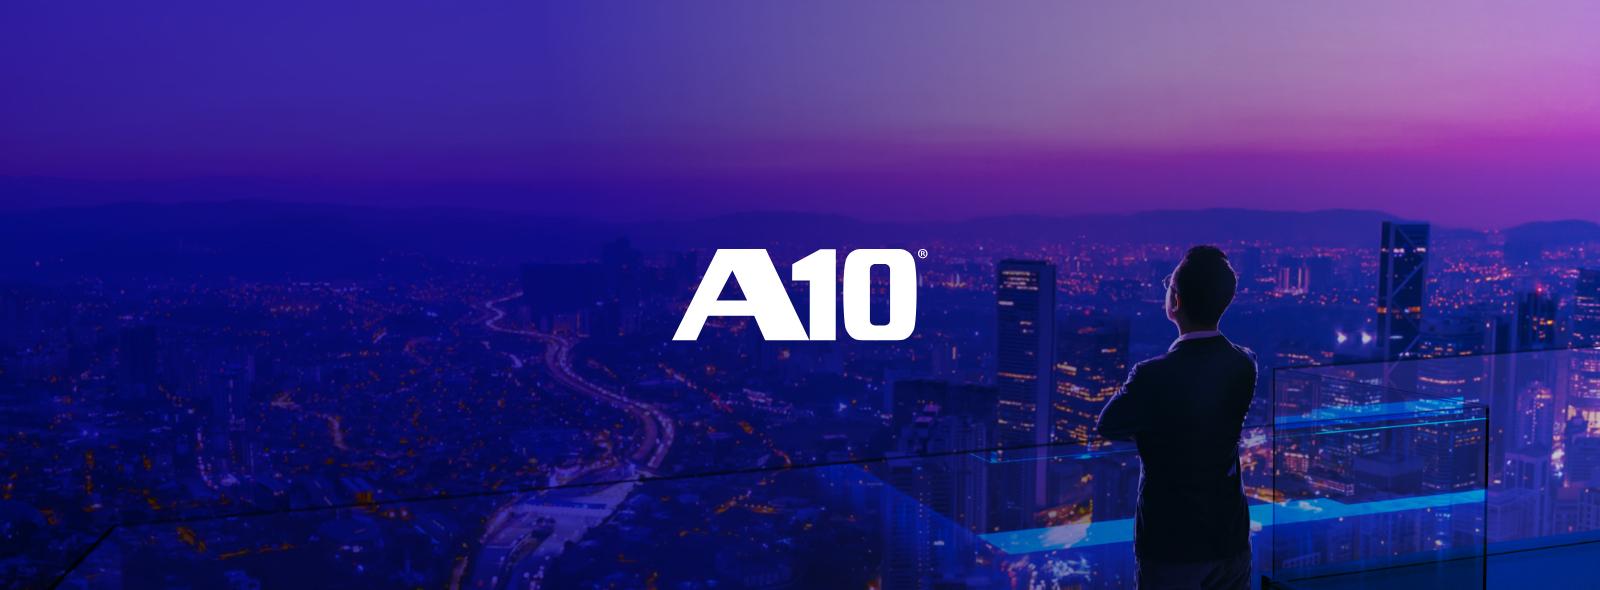 A10 Header Image